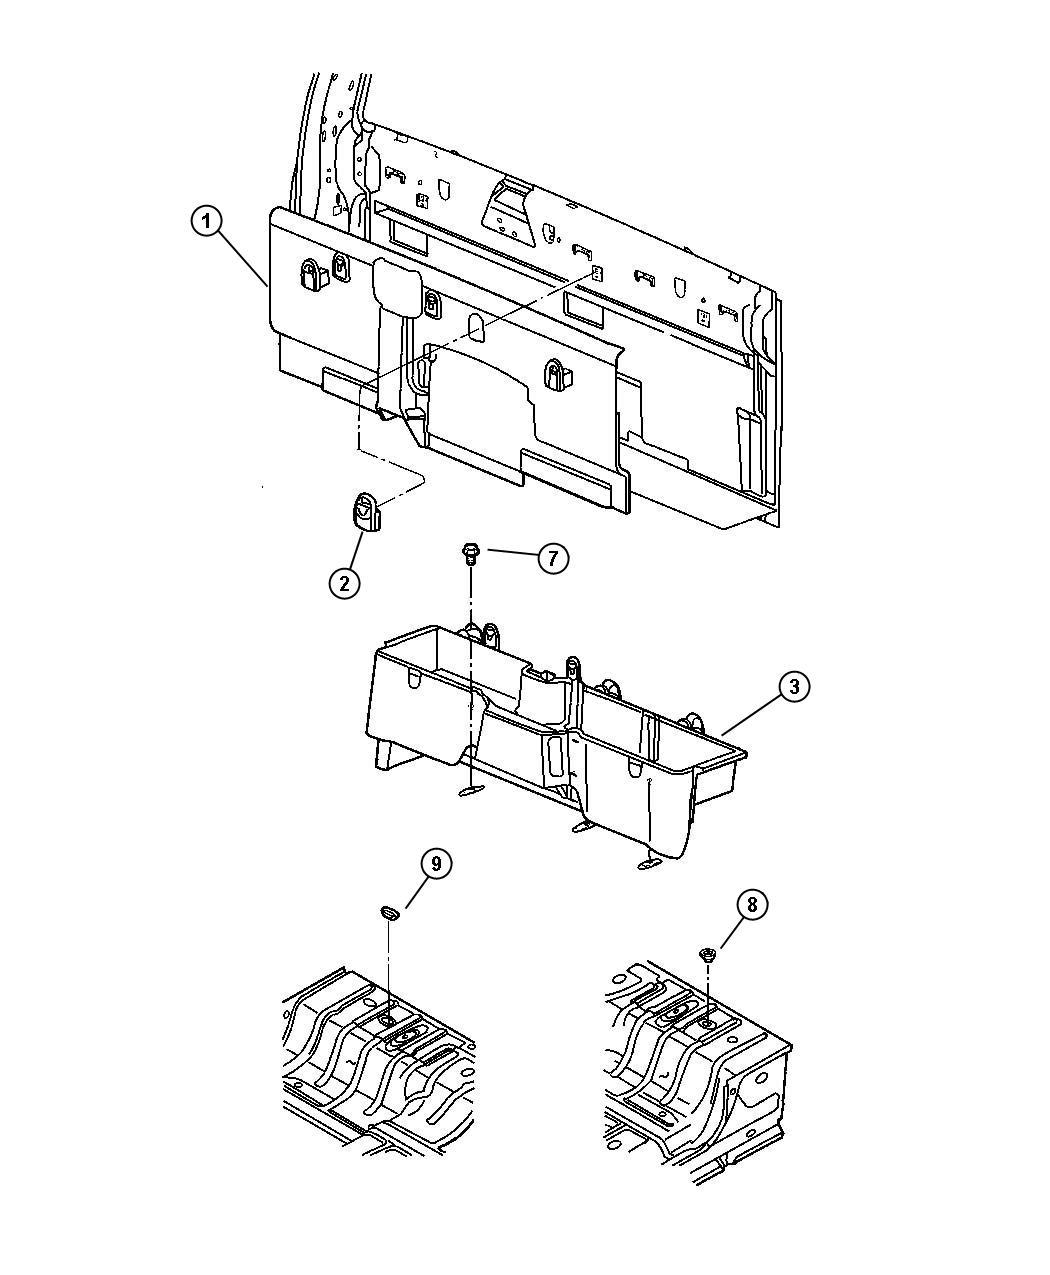 Dodge Ram 1500 Latch. Storage bin lid. [9 alpine speakers